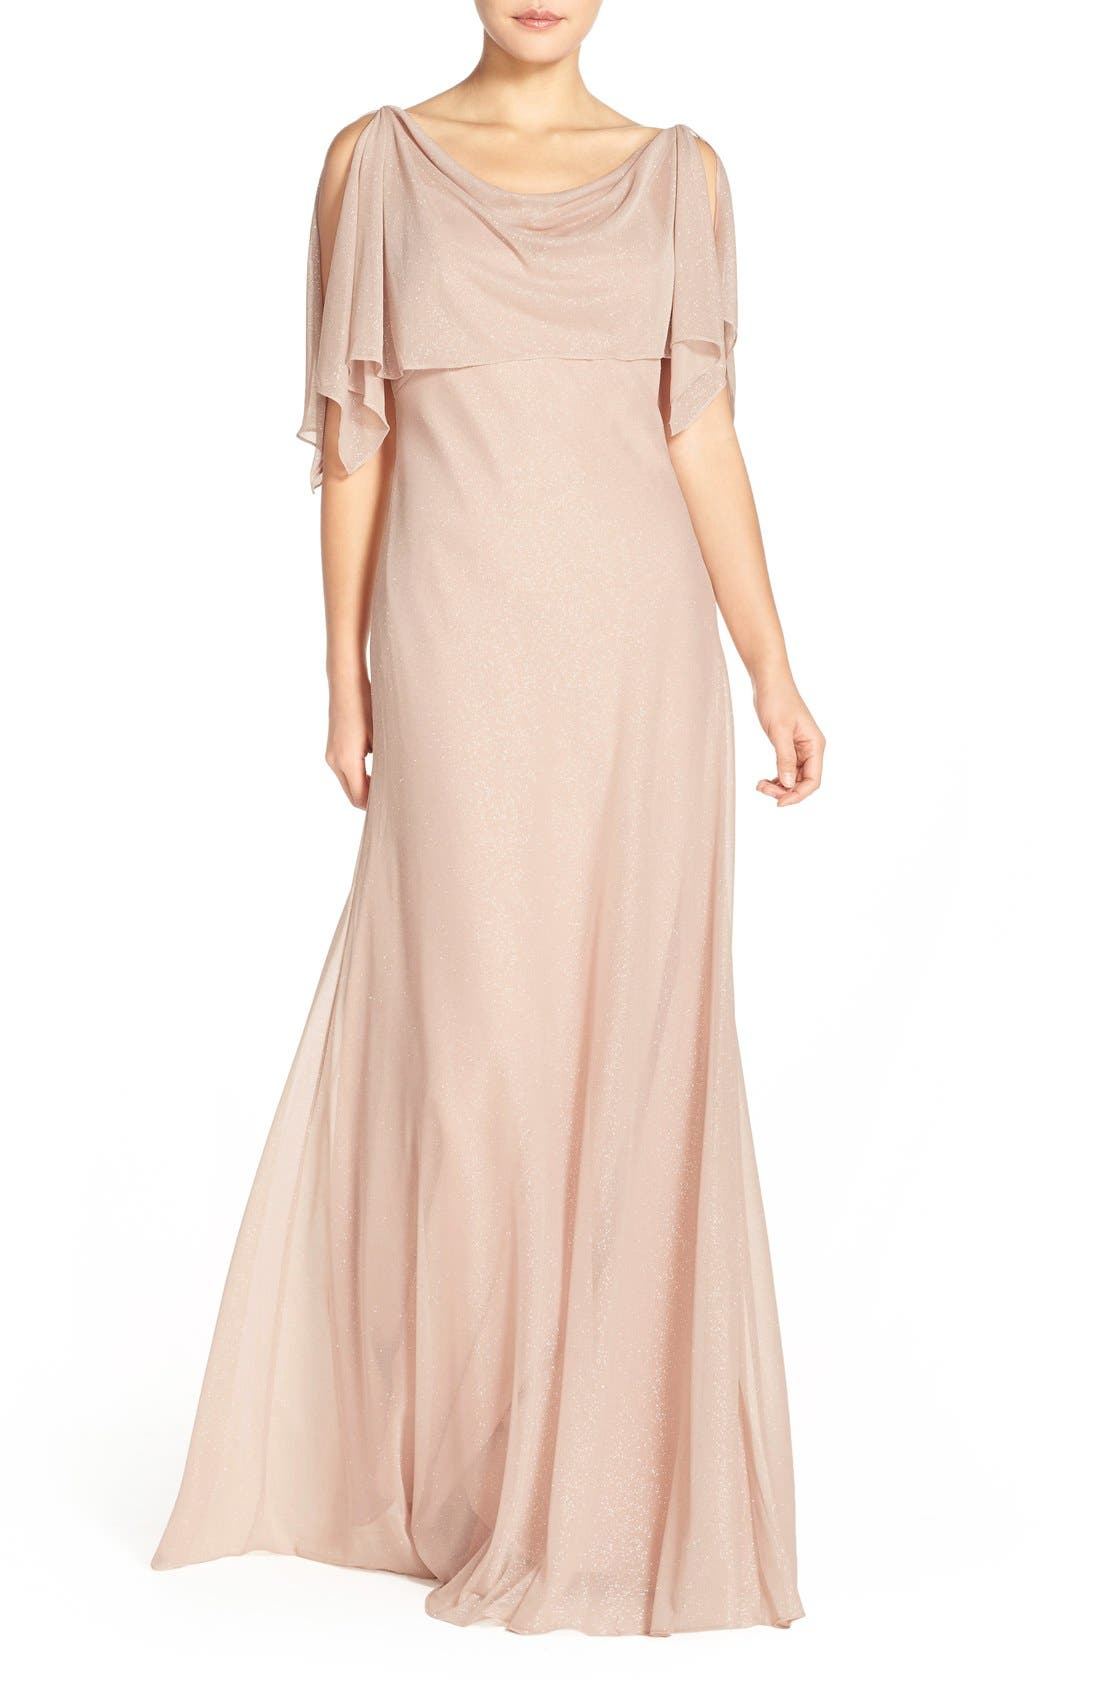 Jenny Yoo 'Devon' Glitter Knit Gown with Detachable Capelet